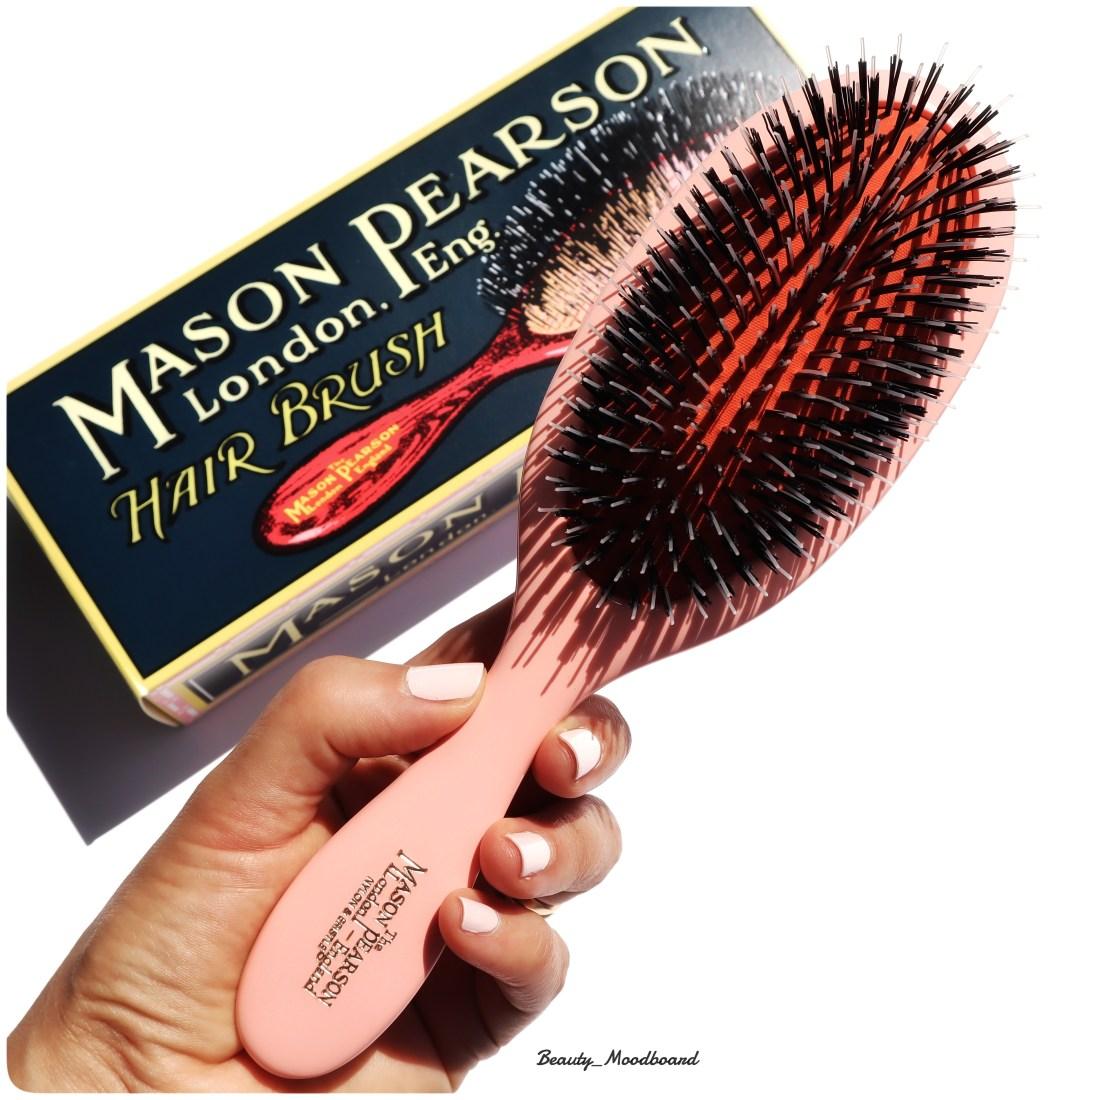 Hair Brush Mason Pearson Handy Mixte Pink